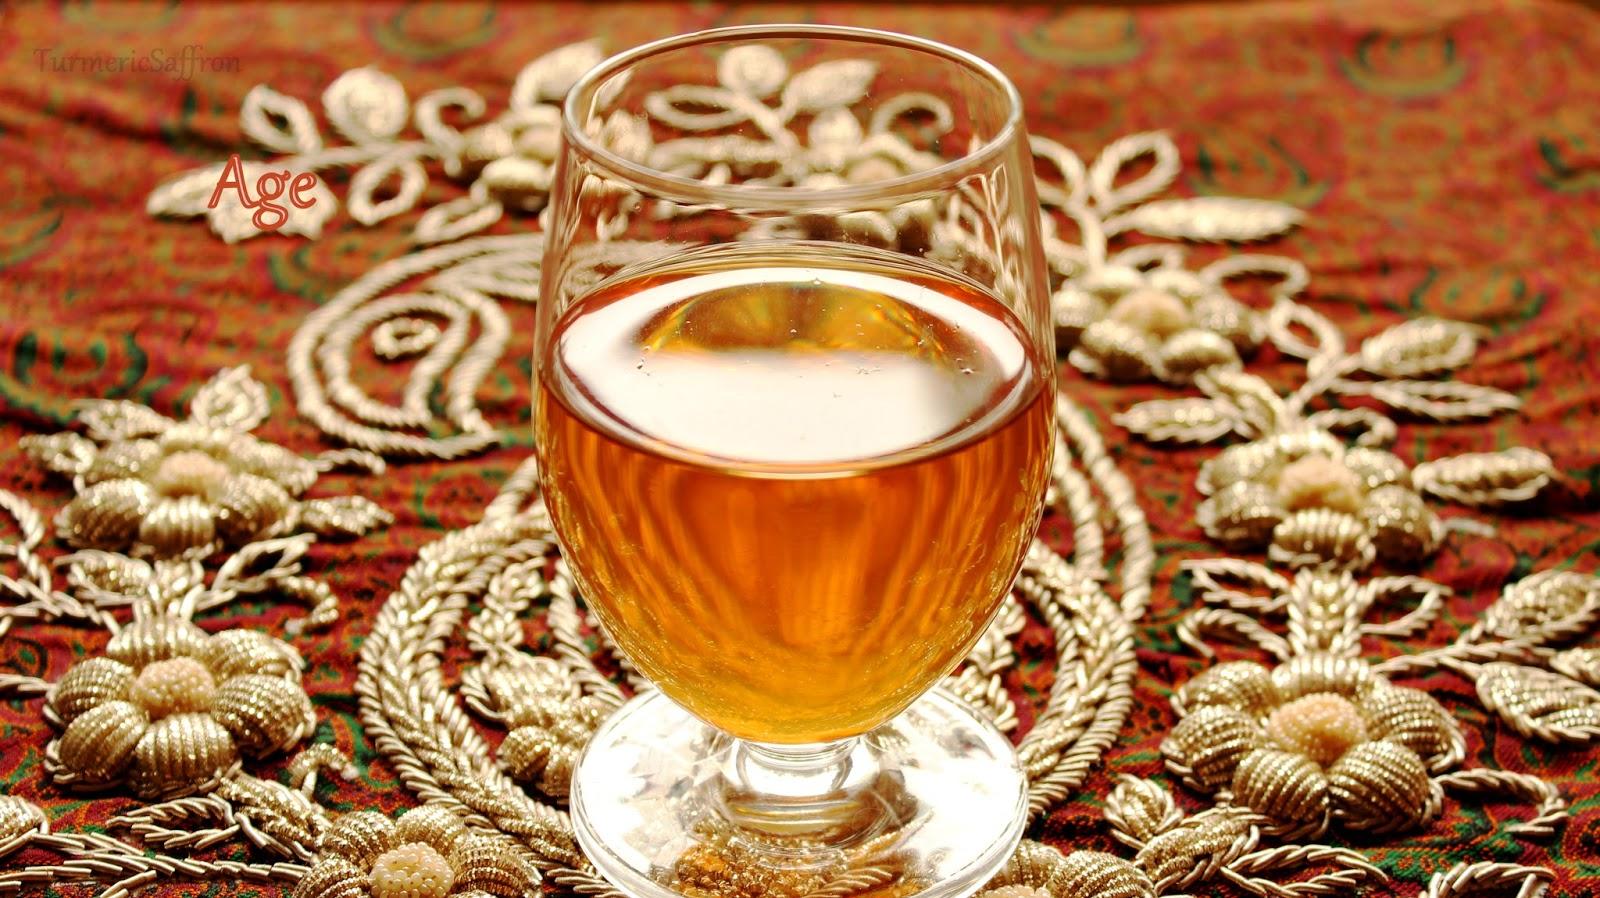 Turmeric & Saffron: Haft Seen Photos - Nowruz 2014